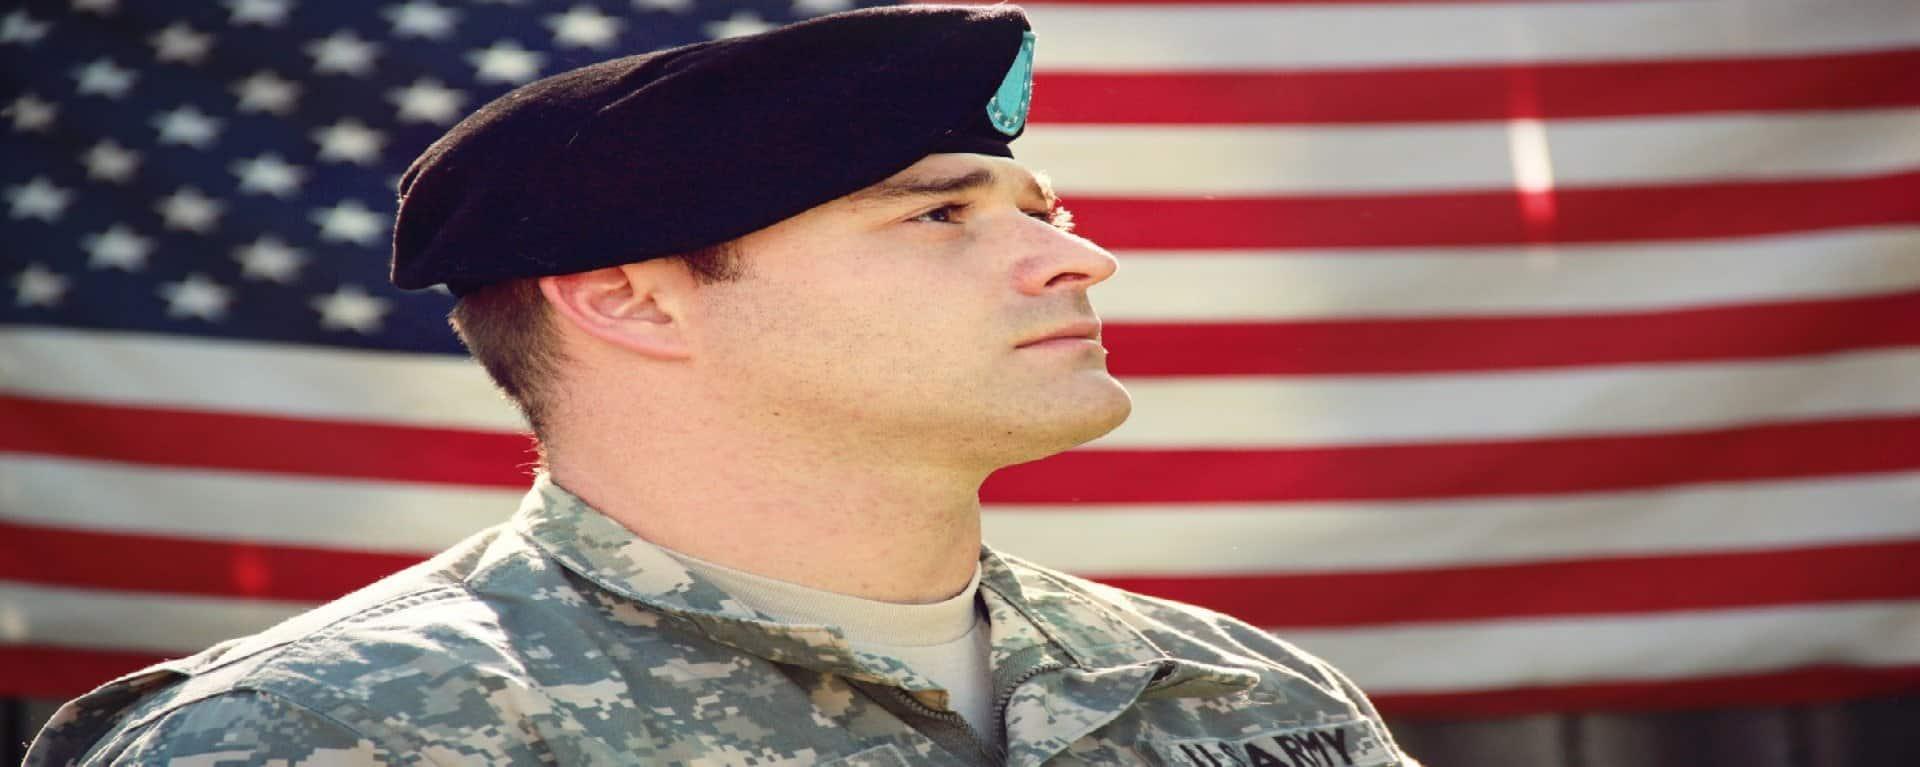 Veterans Home Loan